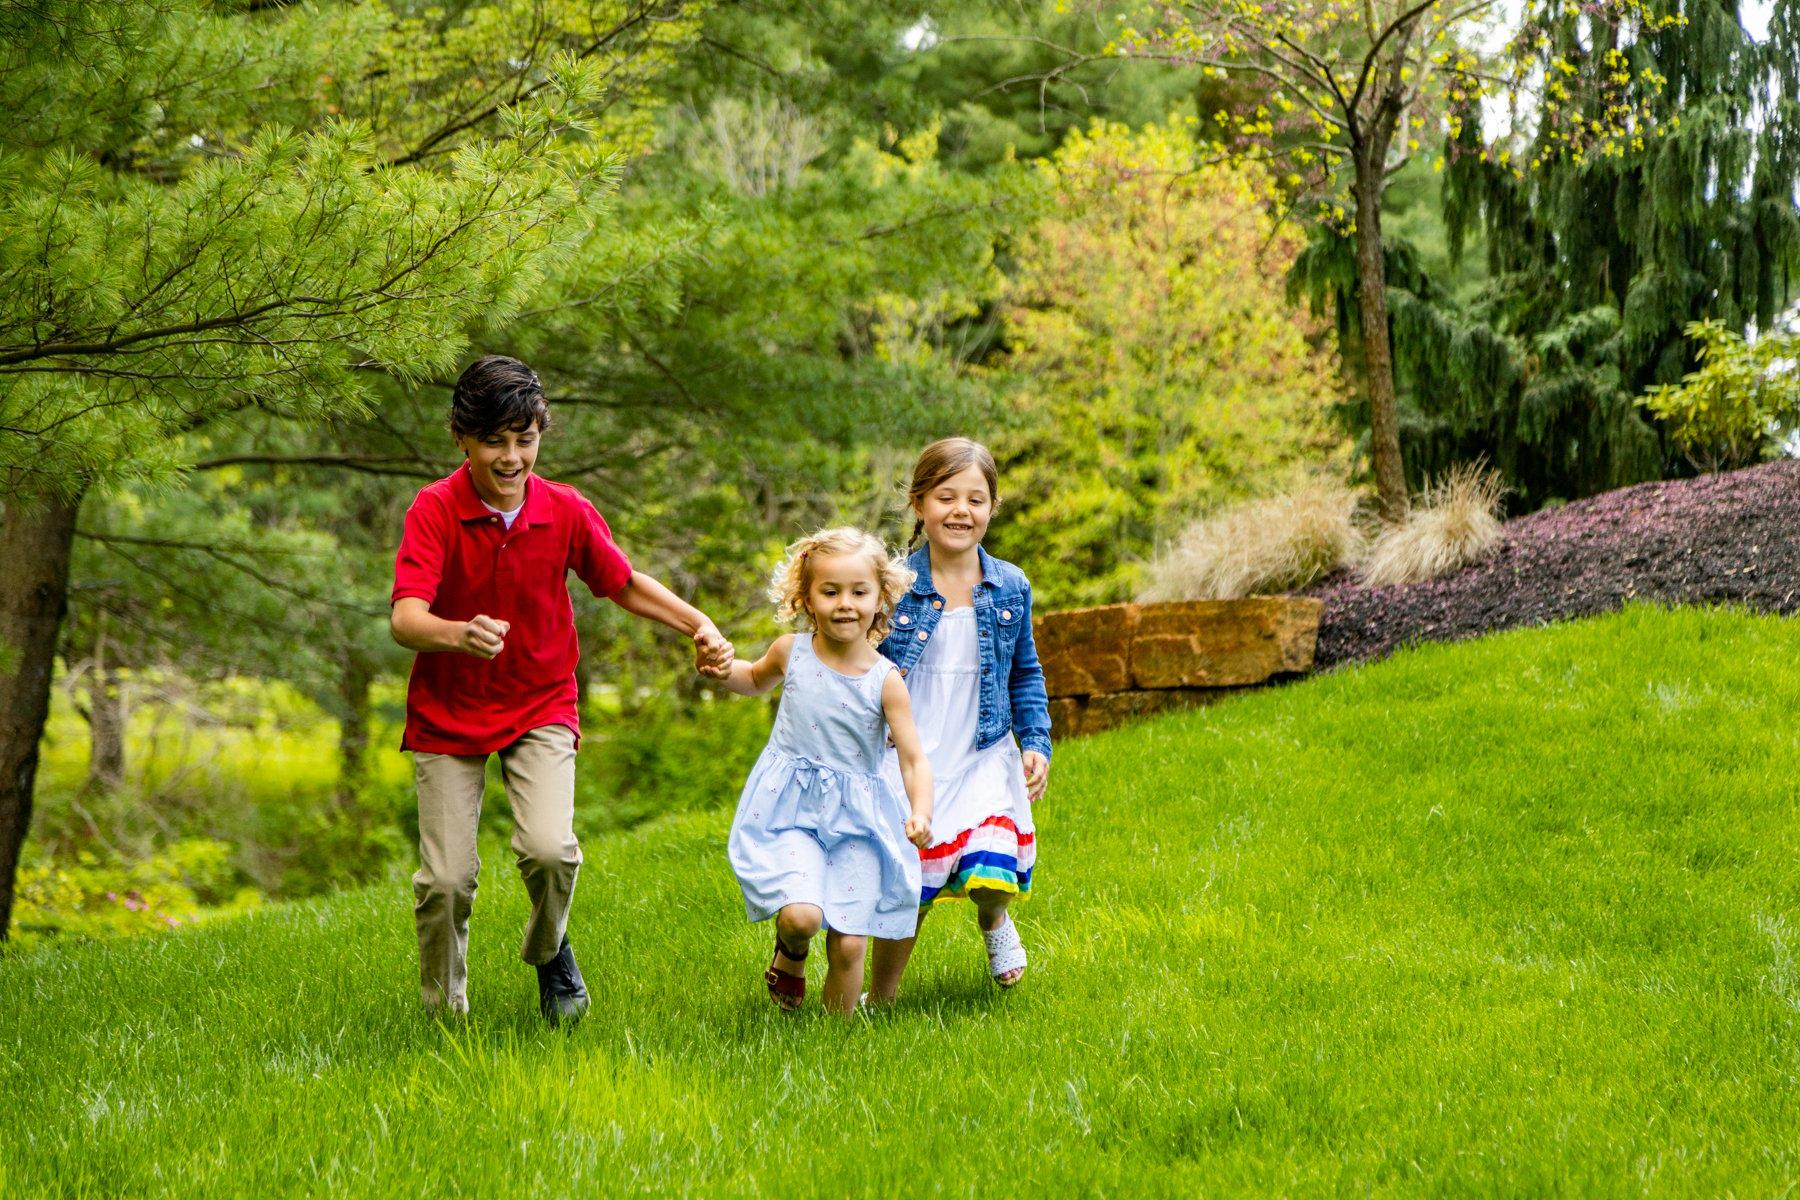 Customers children enjoying their lawn